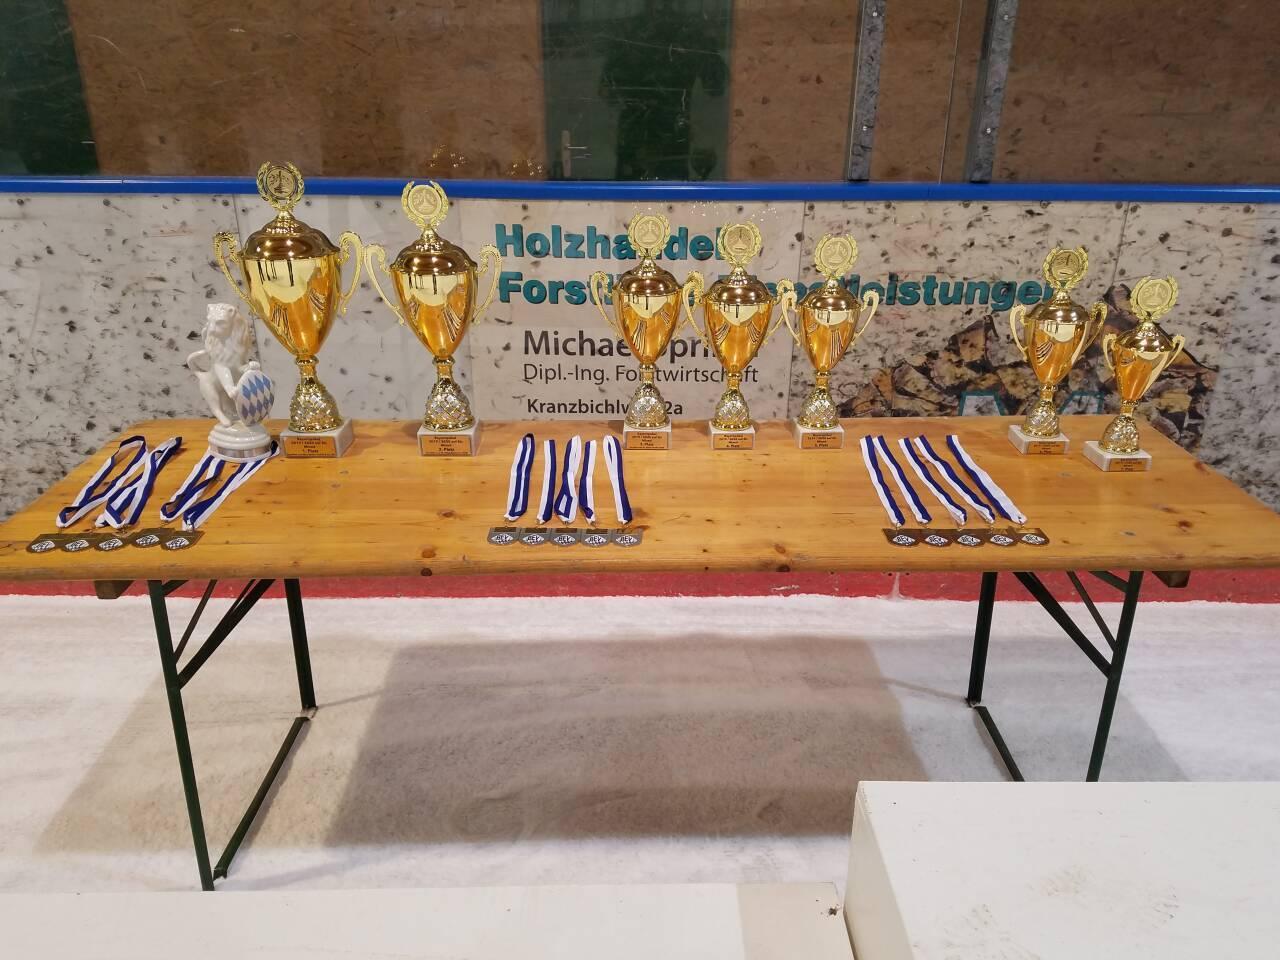 Siegpreise beim Bayernpokal Mixed 2019/2020 in Berchtesgaden